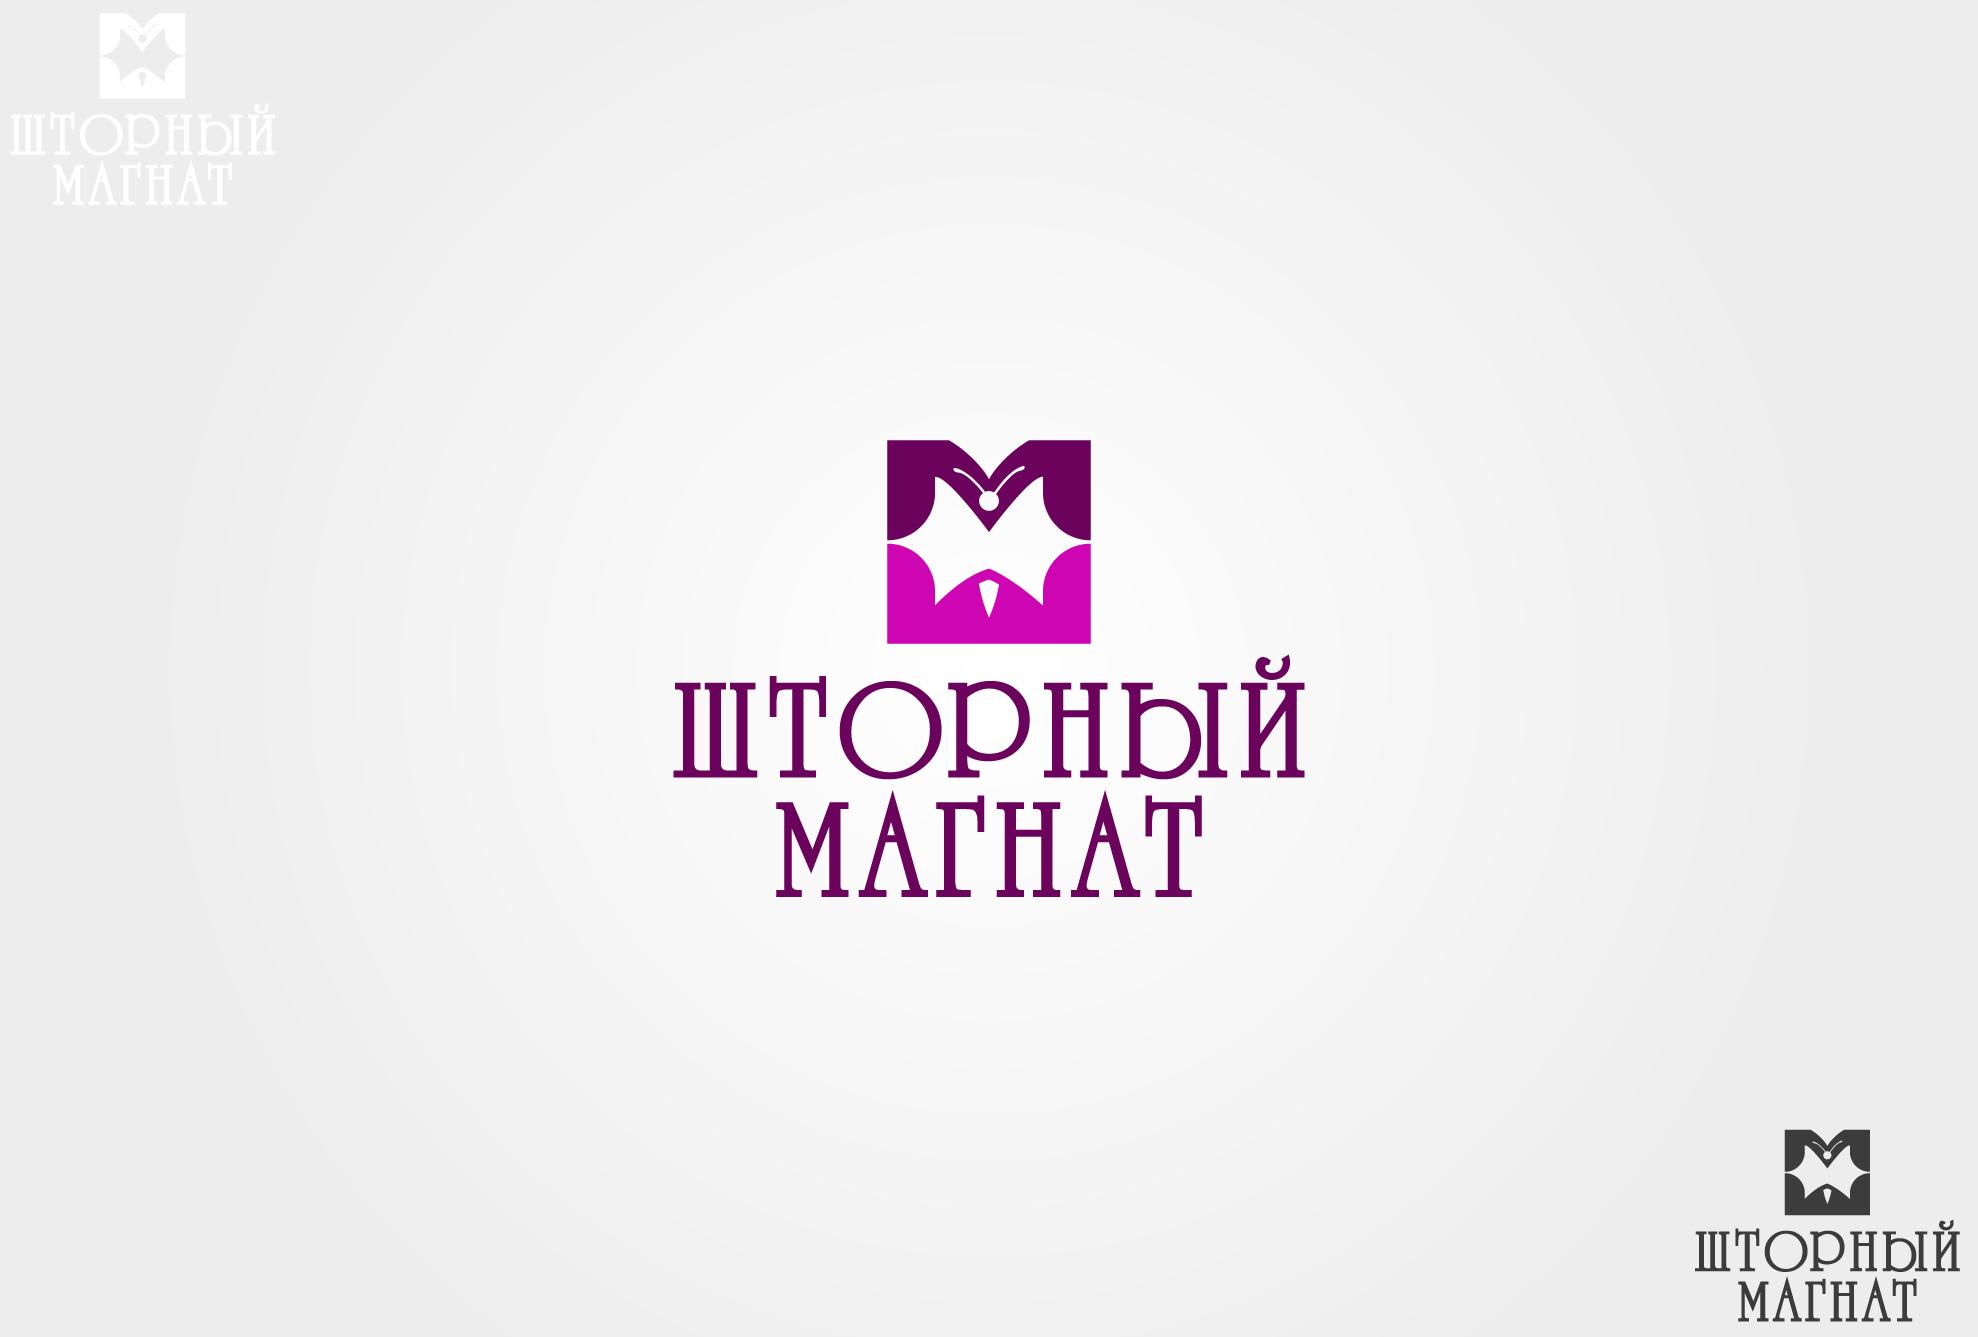 Логотип и фирменный стиль для магазина тканей. фото f_9515cd7fccd7dd90.jpg